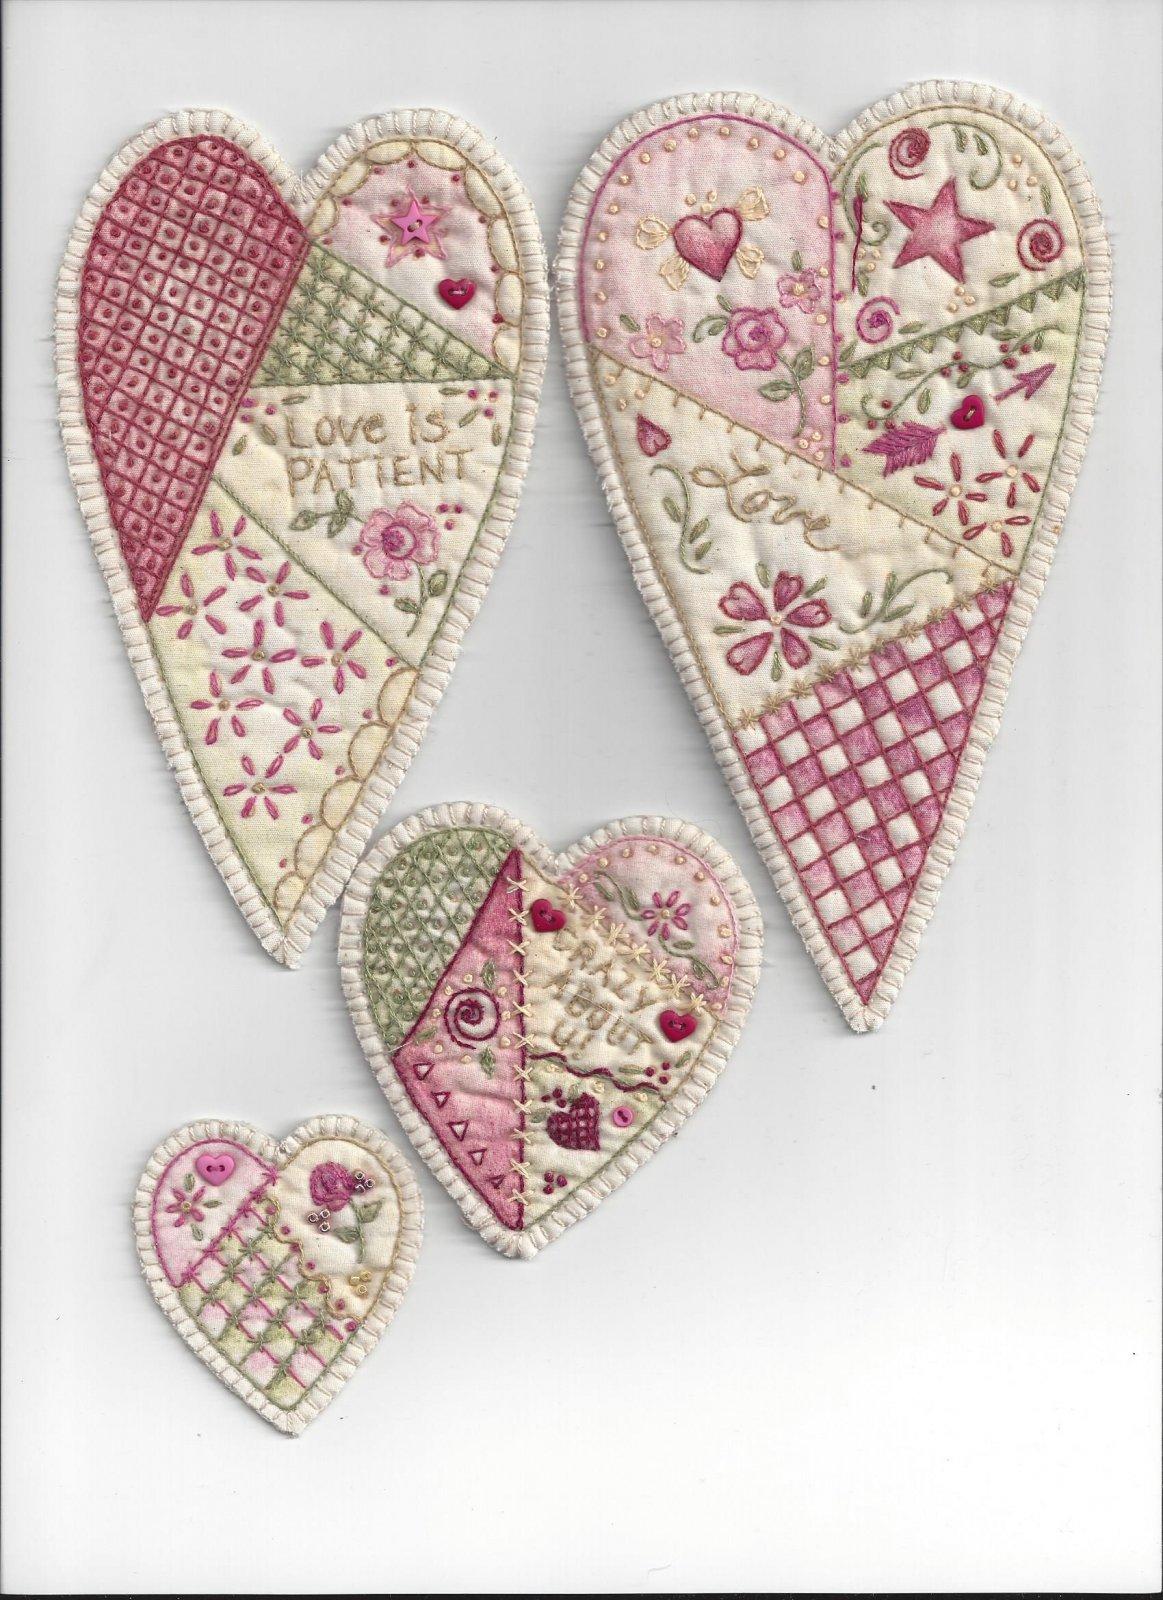 Vintage Valentines Collection I